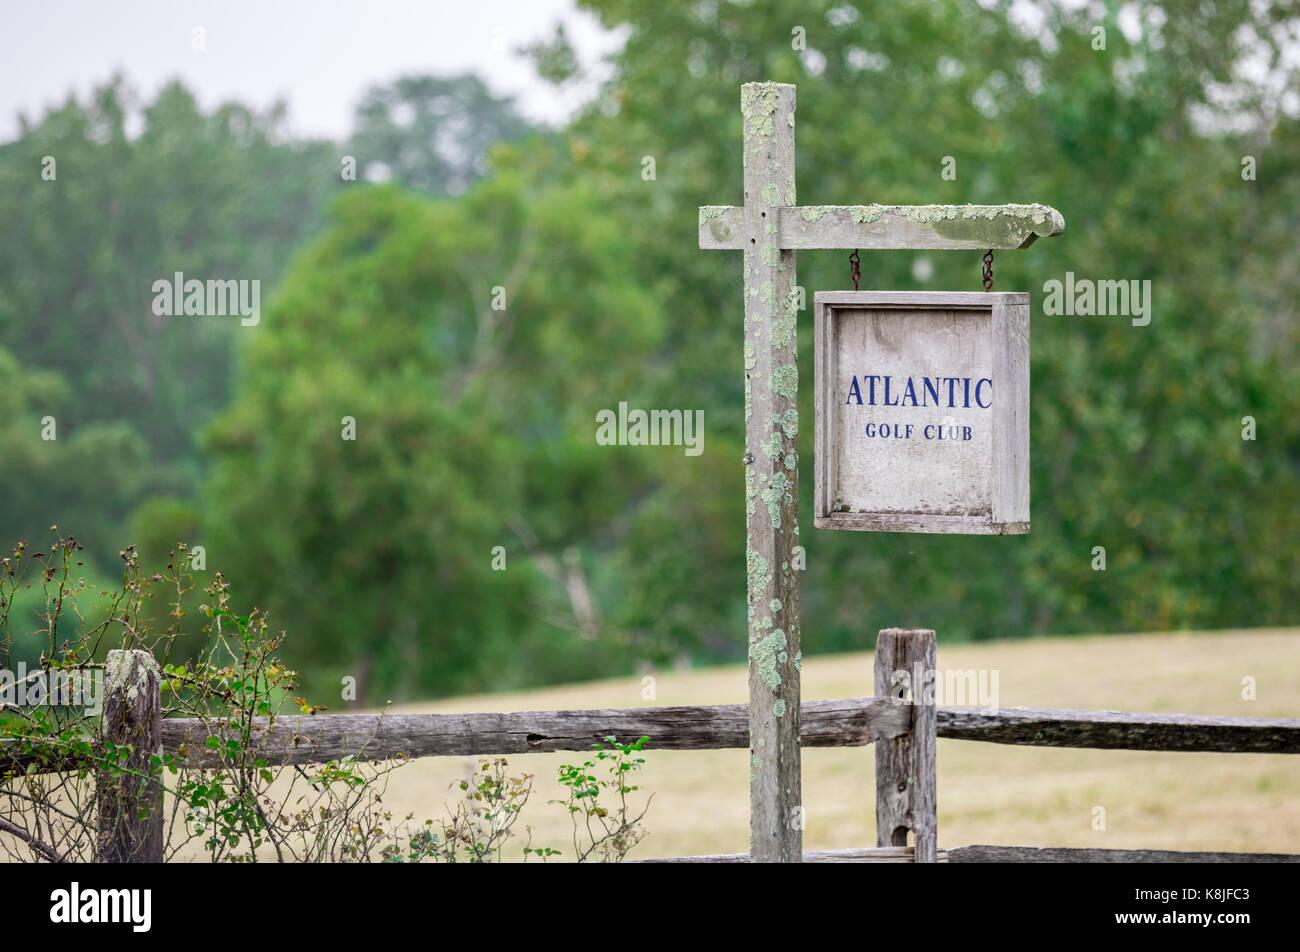 entrance to the private atlantic golf club in bridgehampton, ny - Stock Image